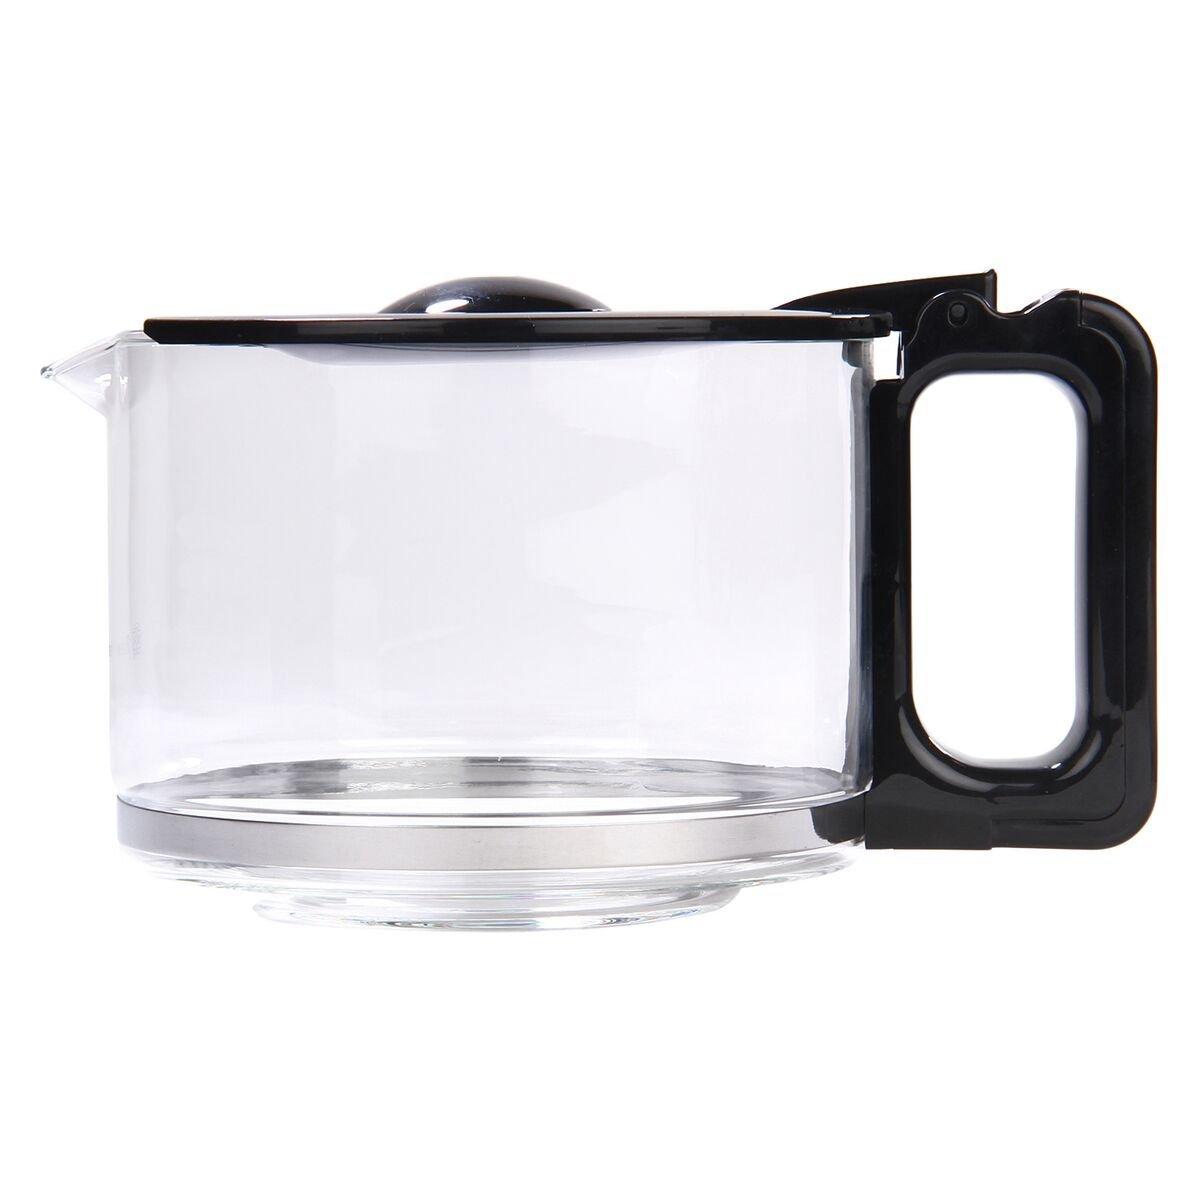 Russell Hobbs RCM2014I 900-Watt 12-Cup Coffee Maker (Black)